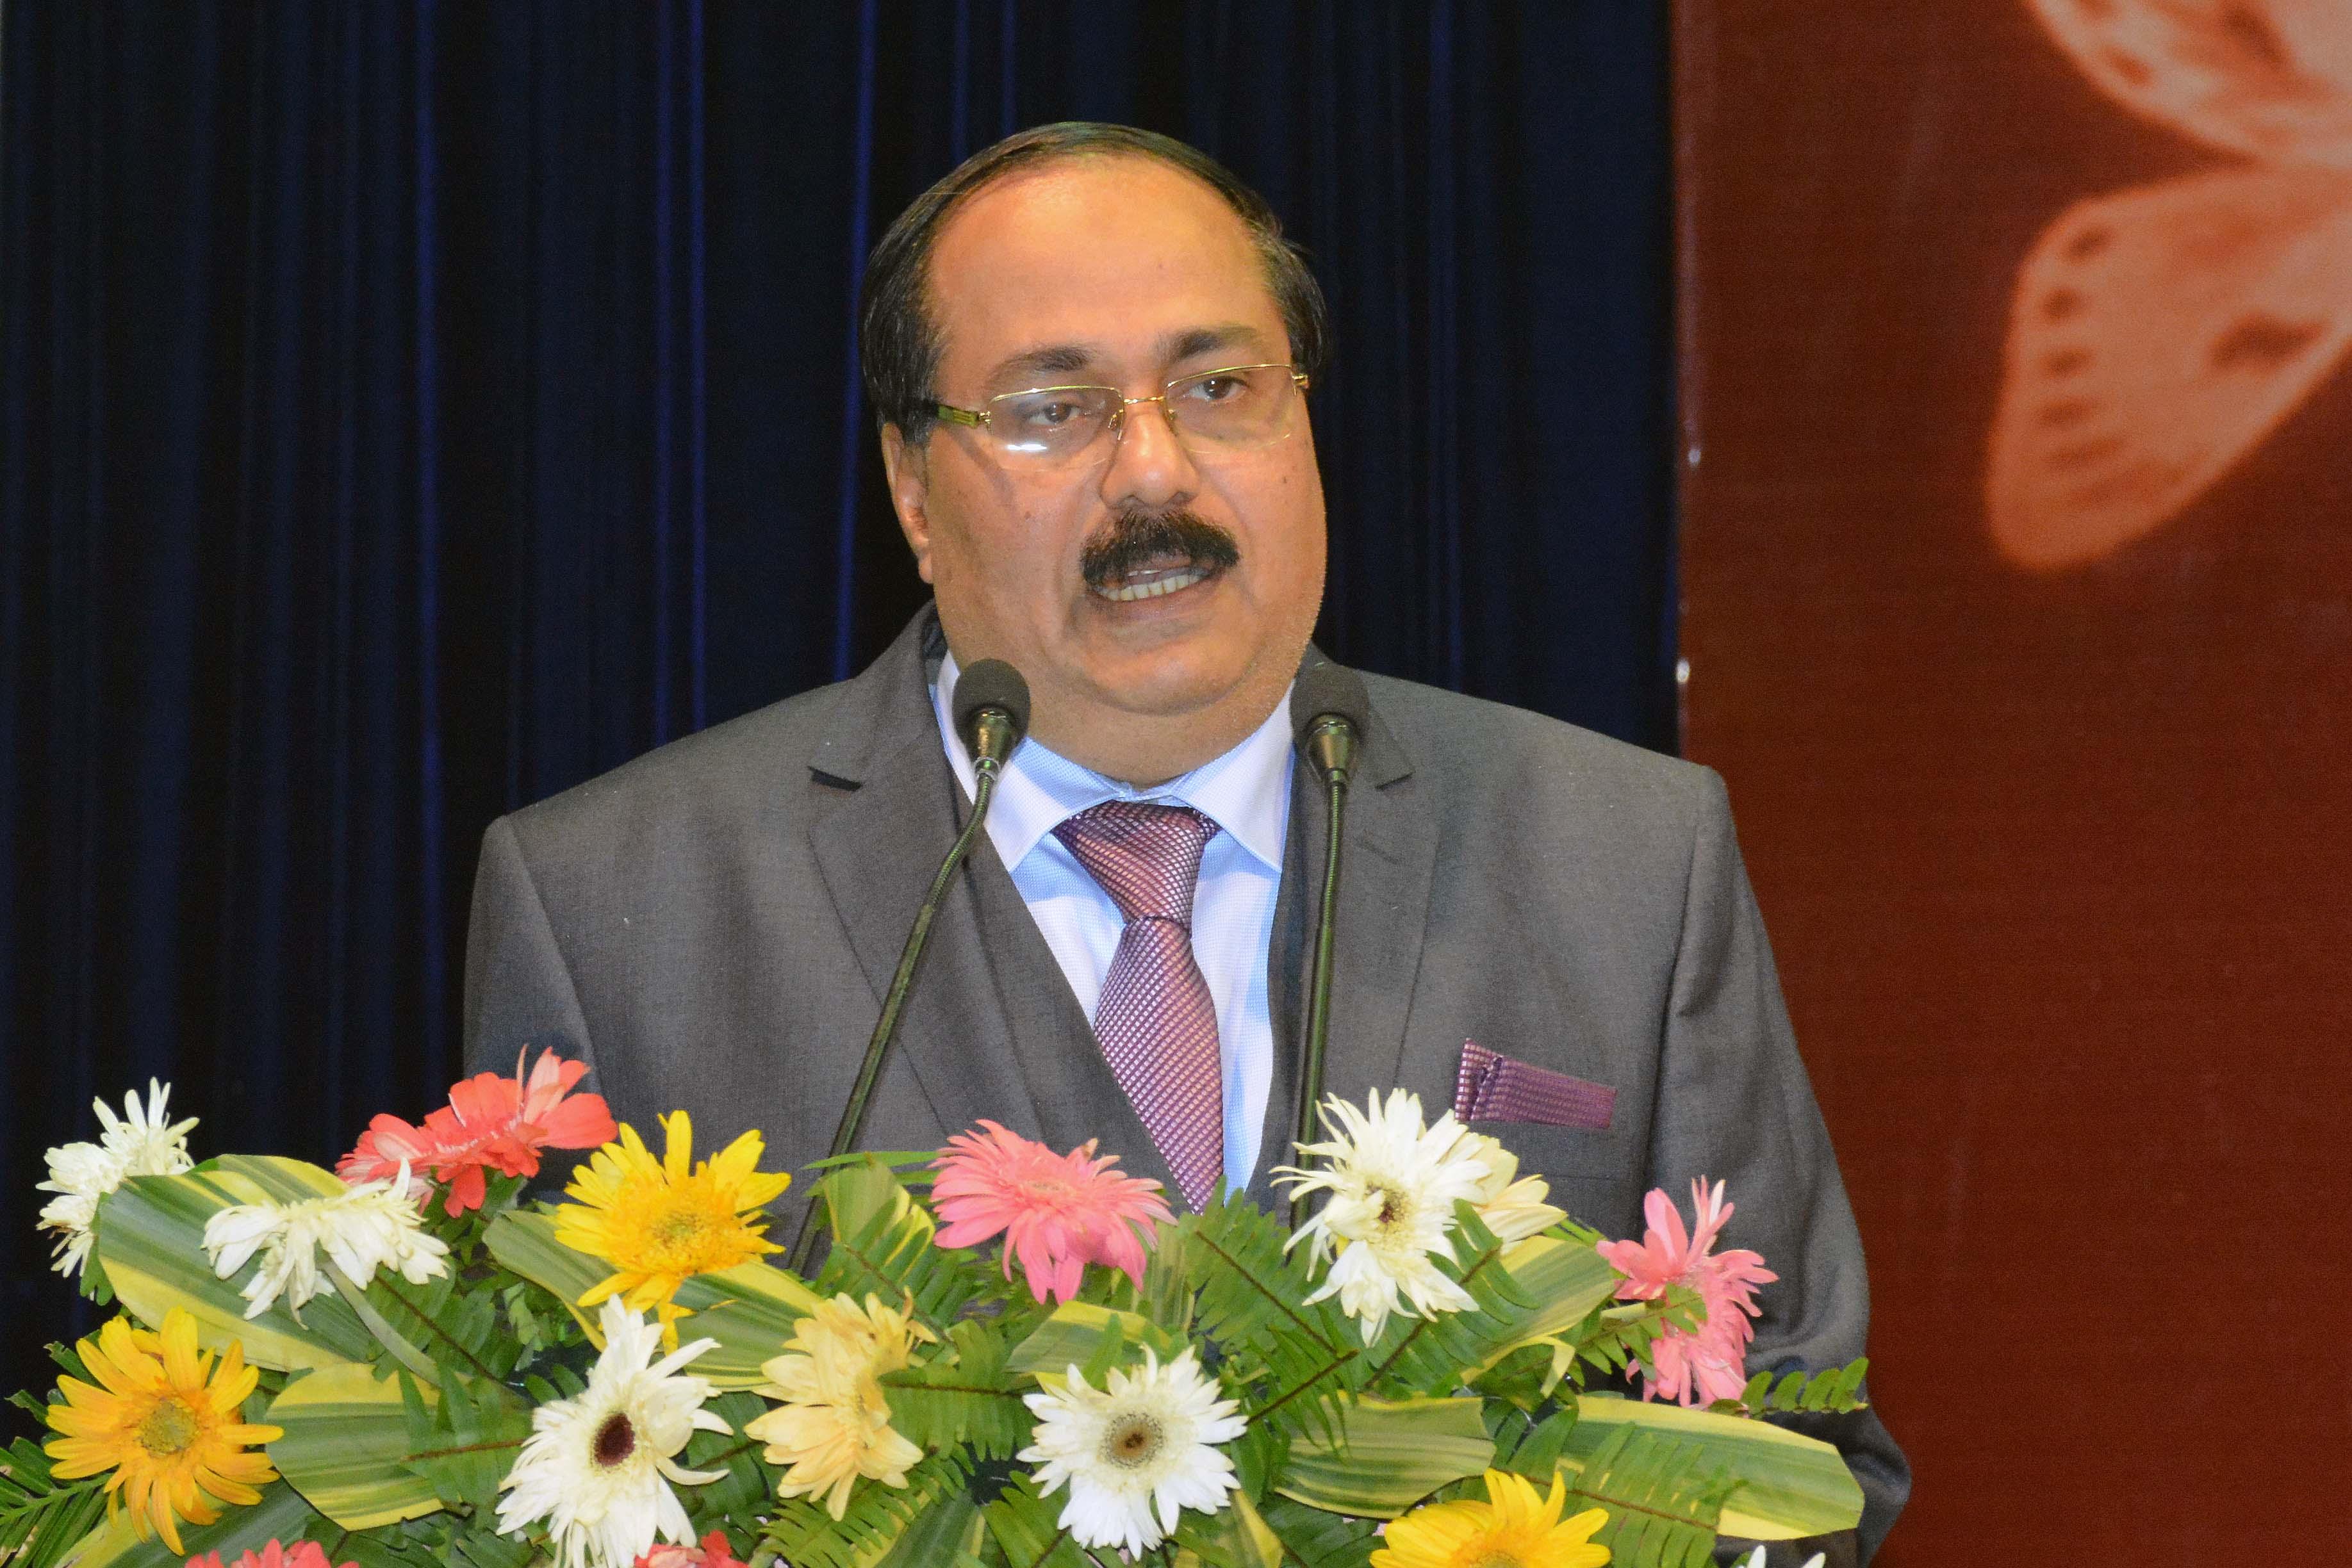 پیشبینی شرکت هندی نالکو: بهبود قیمت آلومینیوم در نیمة دوم سال ۲۰۱۹